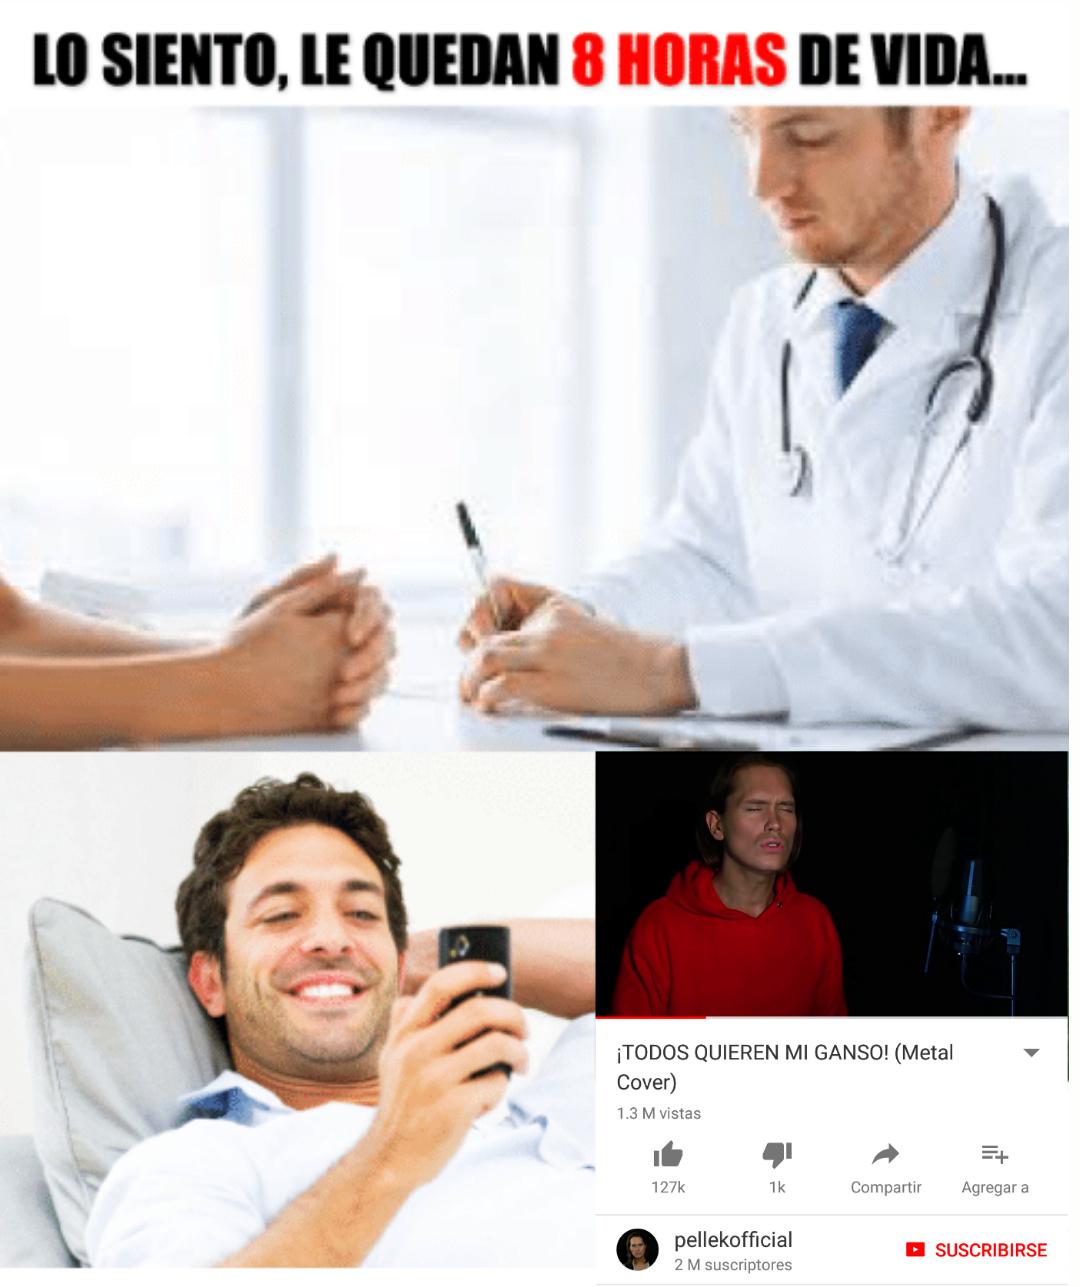 La mejor forma - meme